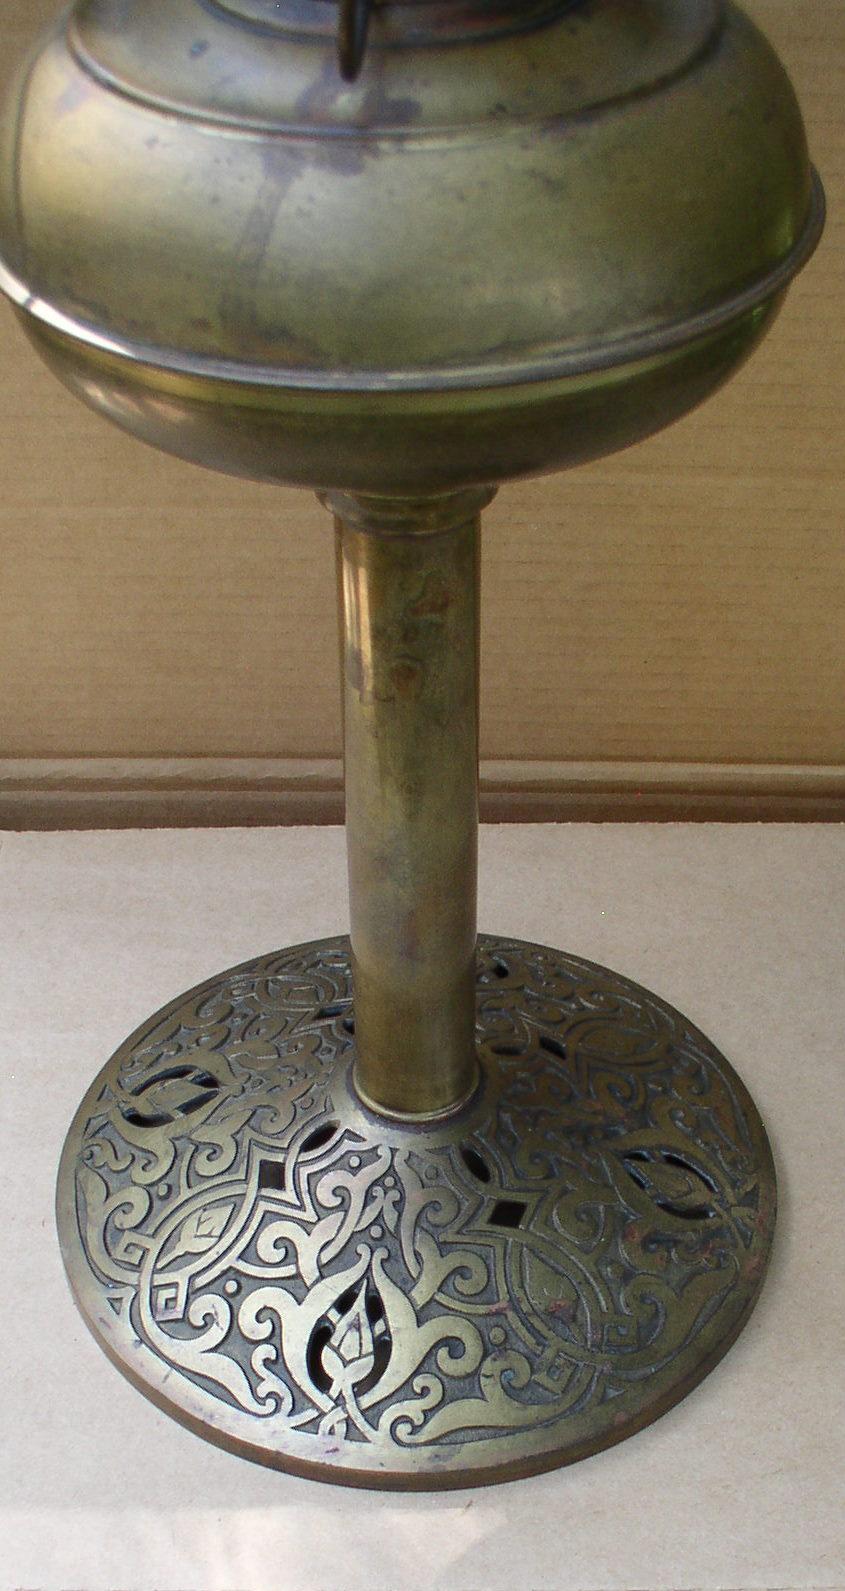 Rayo Center Draft Banquet Oil Lamp Amp Shade Ring Thingery